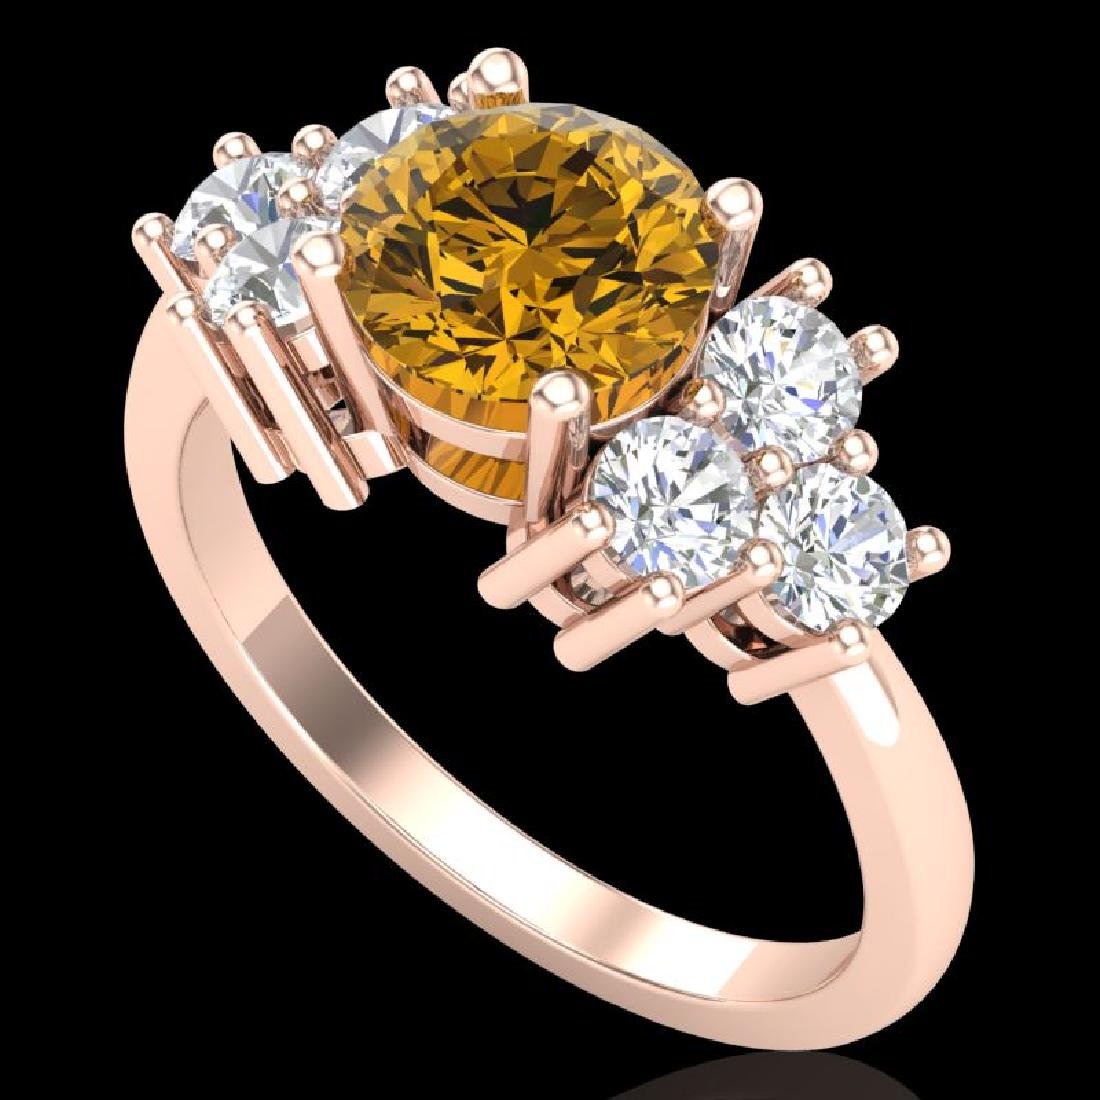 2.1 CTW Intense Fancy Yellow Diamond Solitaire Classic